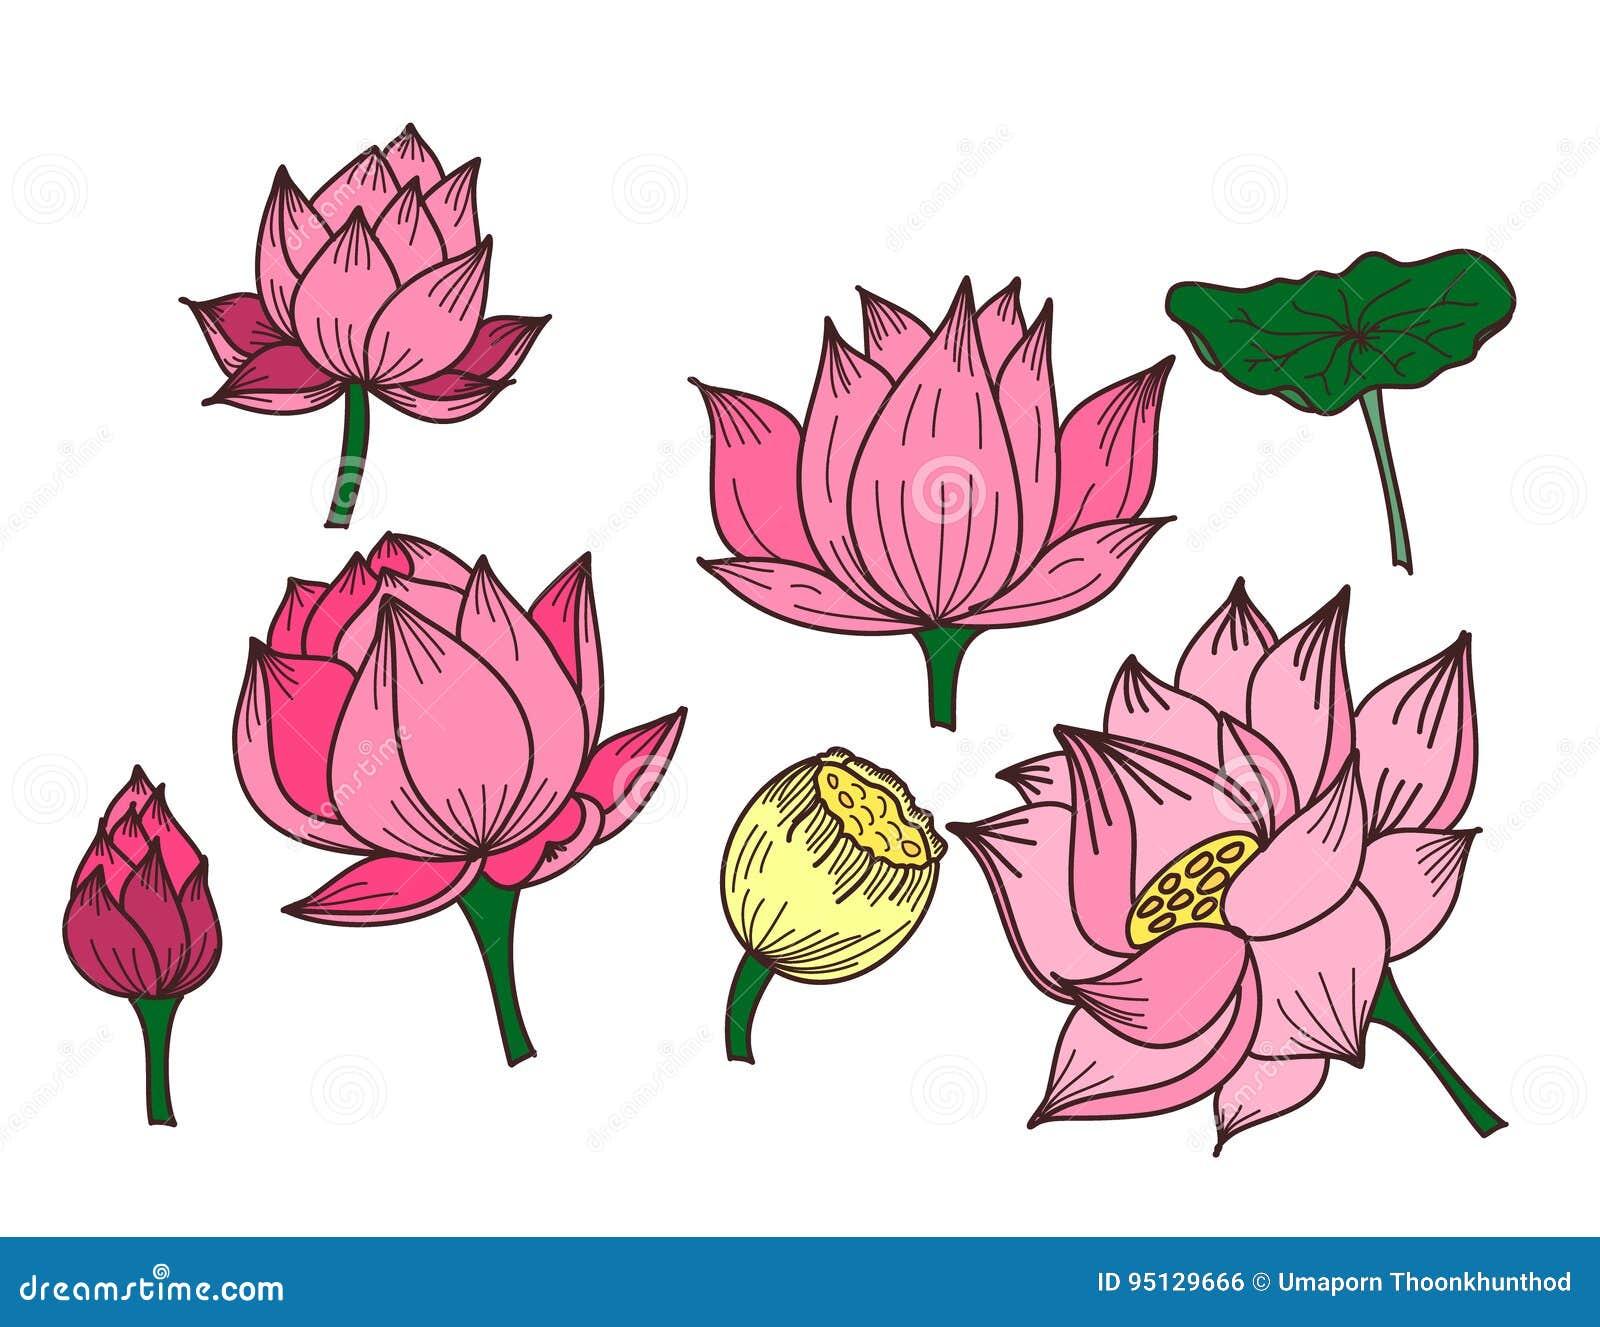 Circle Hand Drawn Lotus Flower Stock Vector Illustration Of Circle